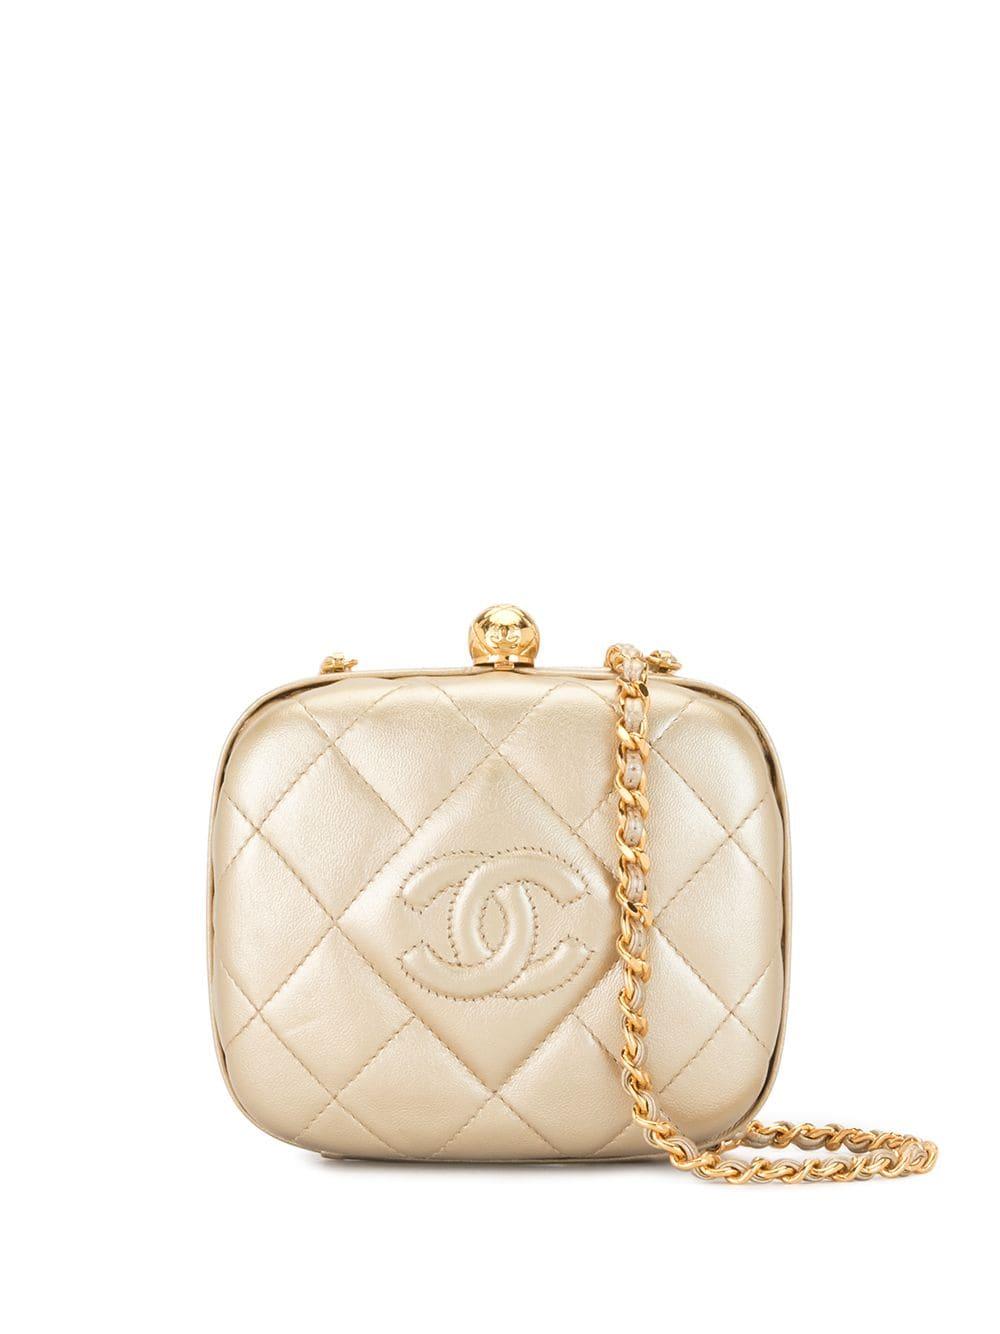 Chanel Pre-Owned 1995 Umhängetasche mit CC - Gold